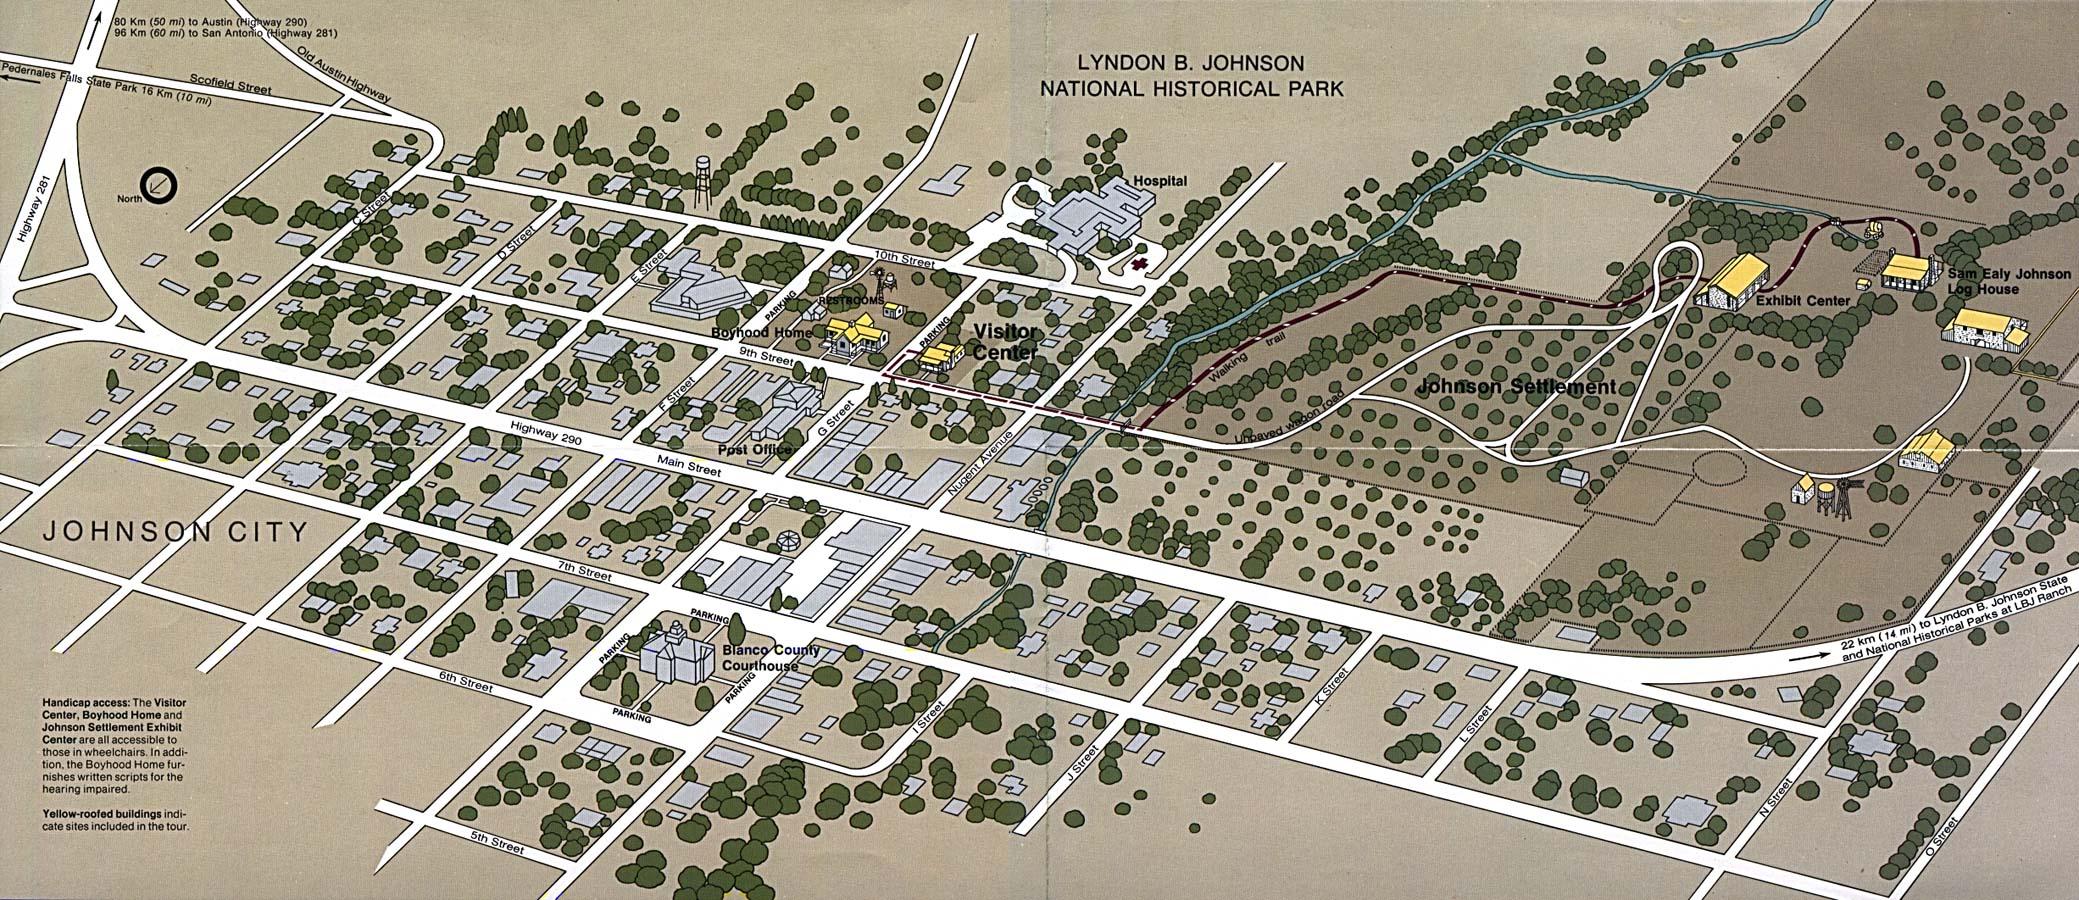 Mapa del Parque Nacional Histórico Lyndon B. Johnson, Johnson City, Estados Unidos